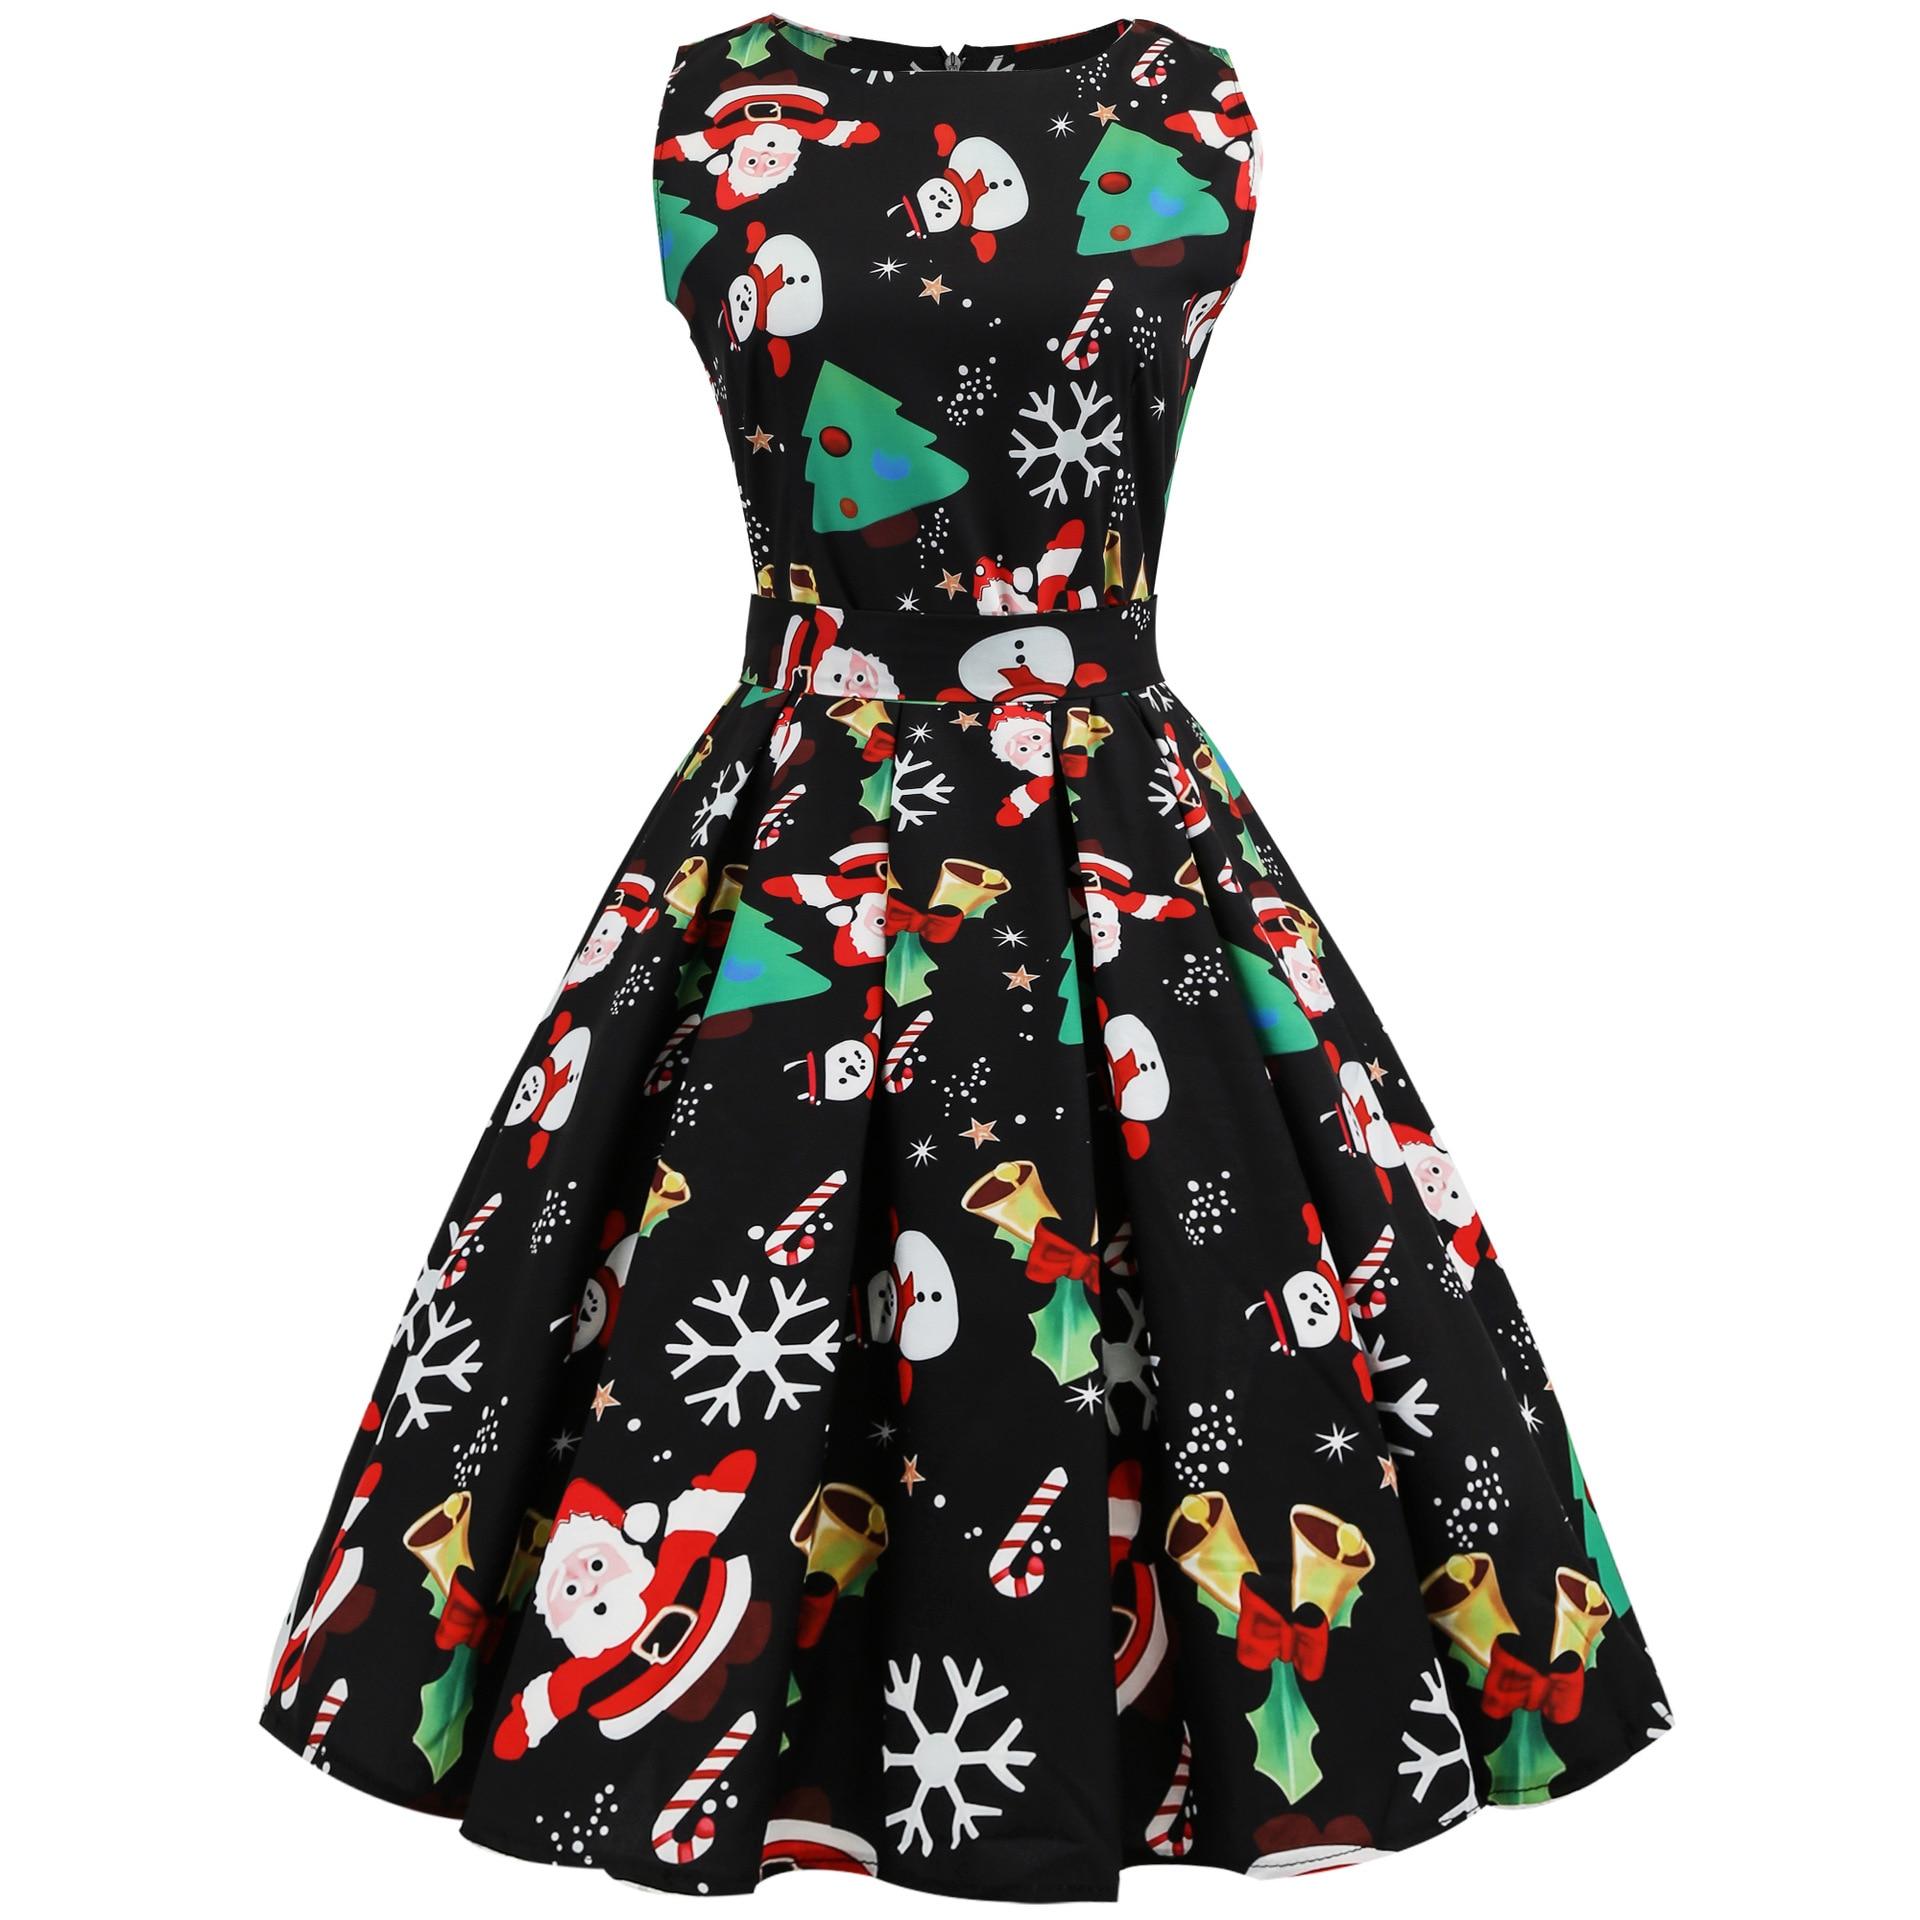 Plus Size Christmas Dress Women Floral Print Slim Vintage Dress Casual  Sleeveless Elegant Midi Party Dresses Vestidos Robe Femme